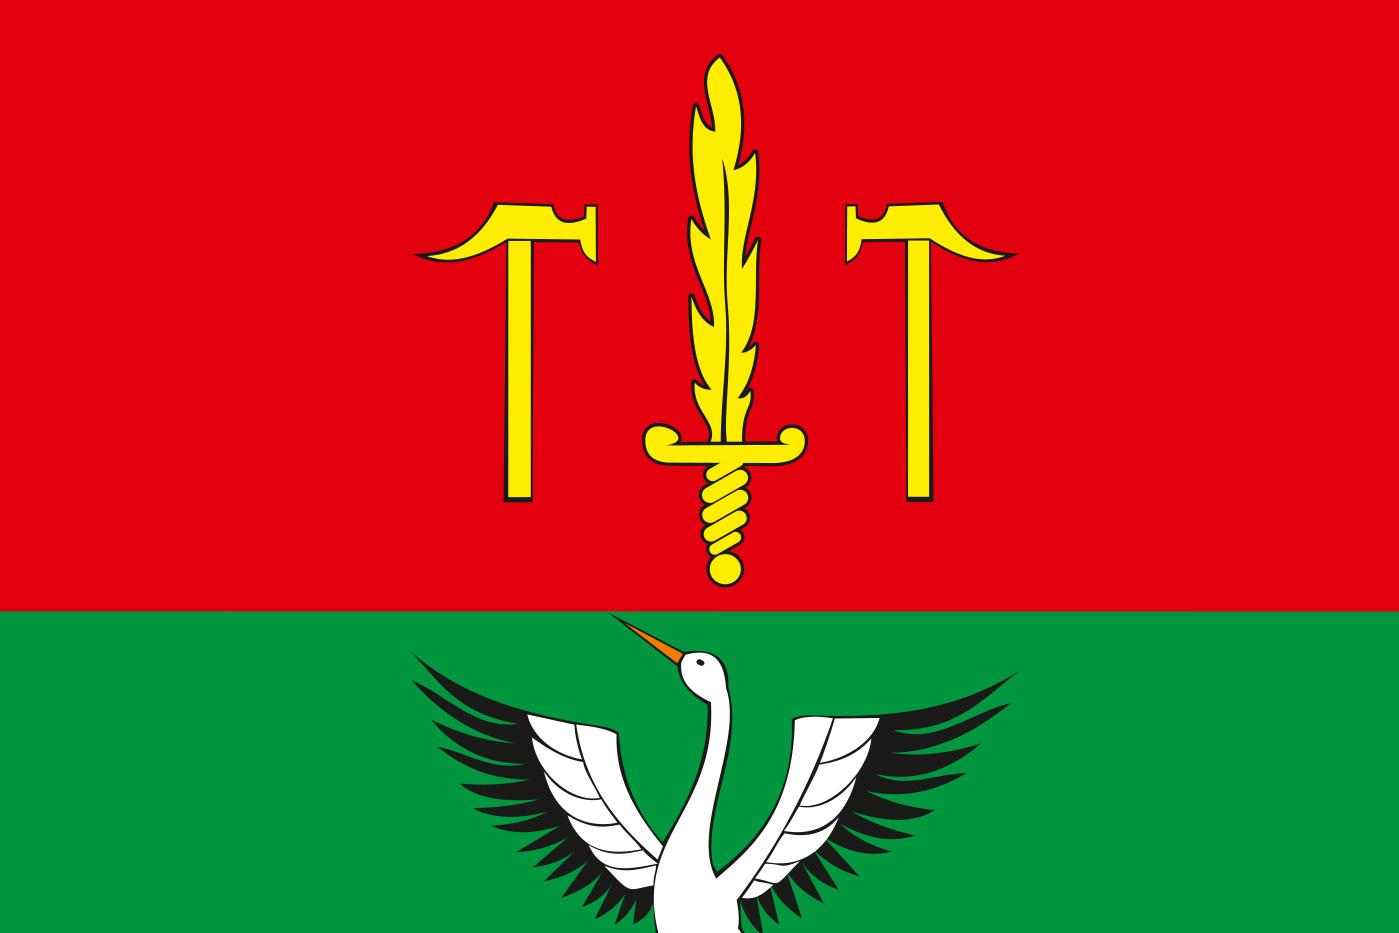 Флаг Талдома